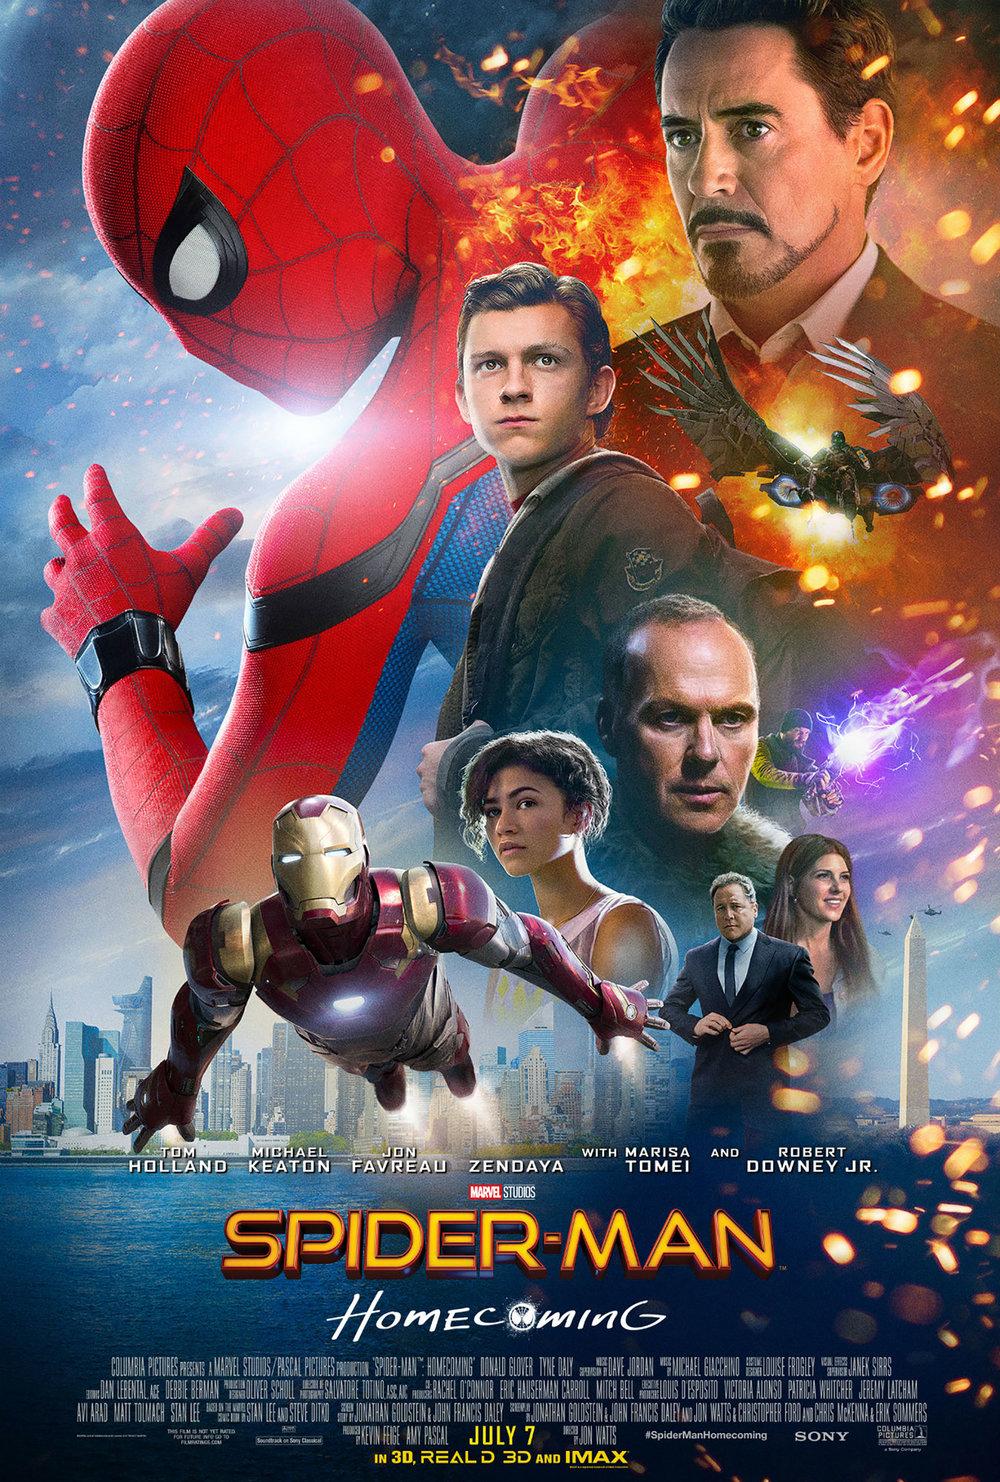 spider-man-homecoming-movie-poster-marvel-cinematic-universe-1038913.jpg